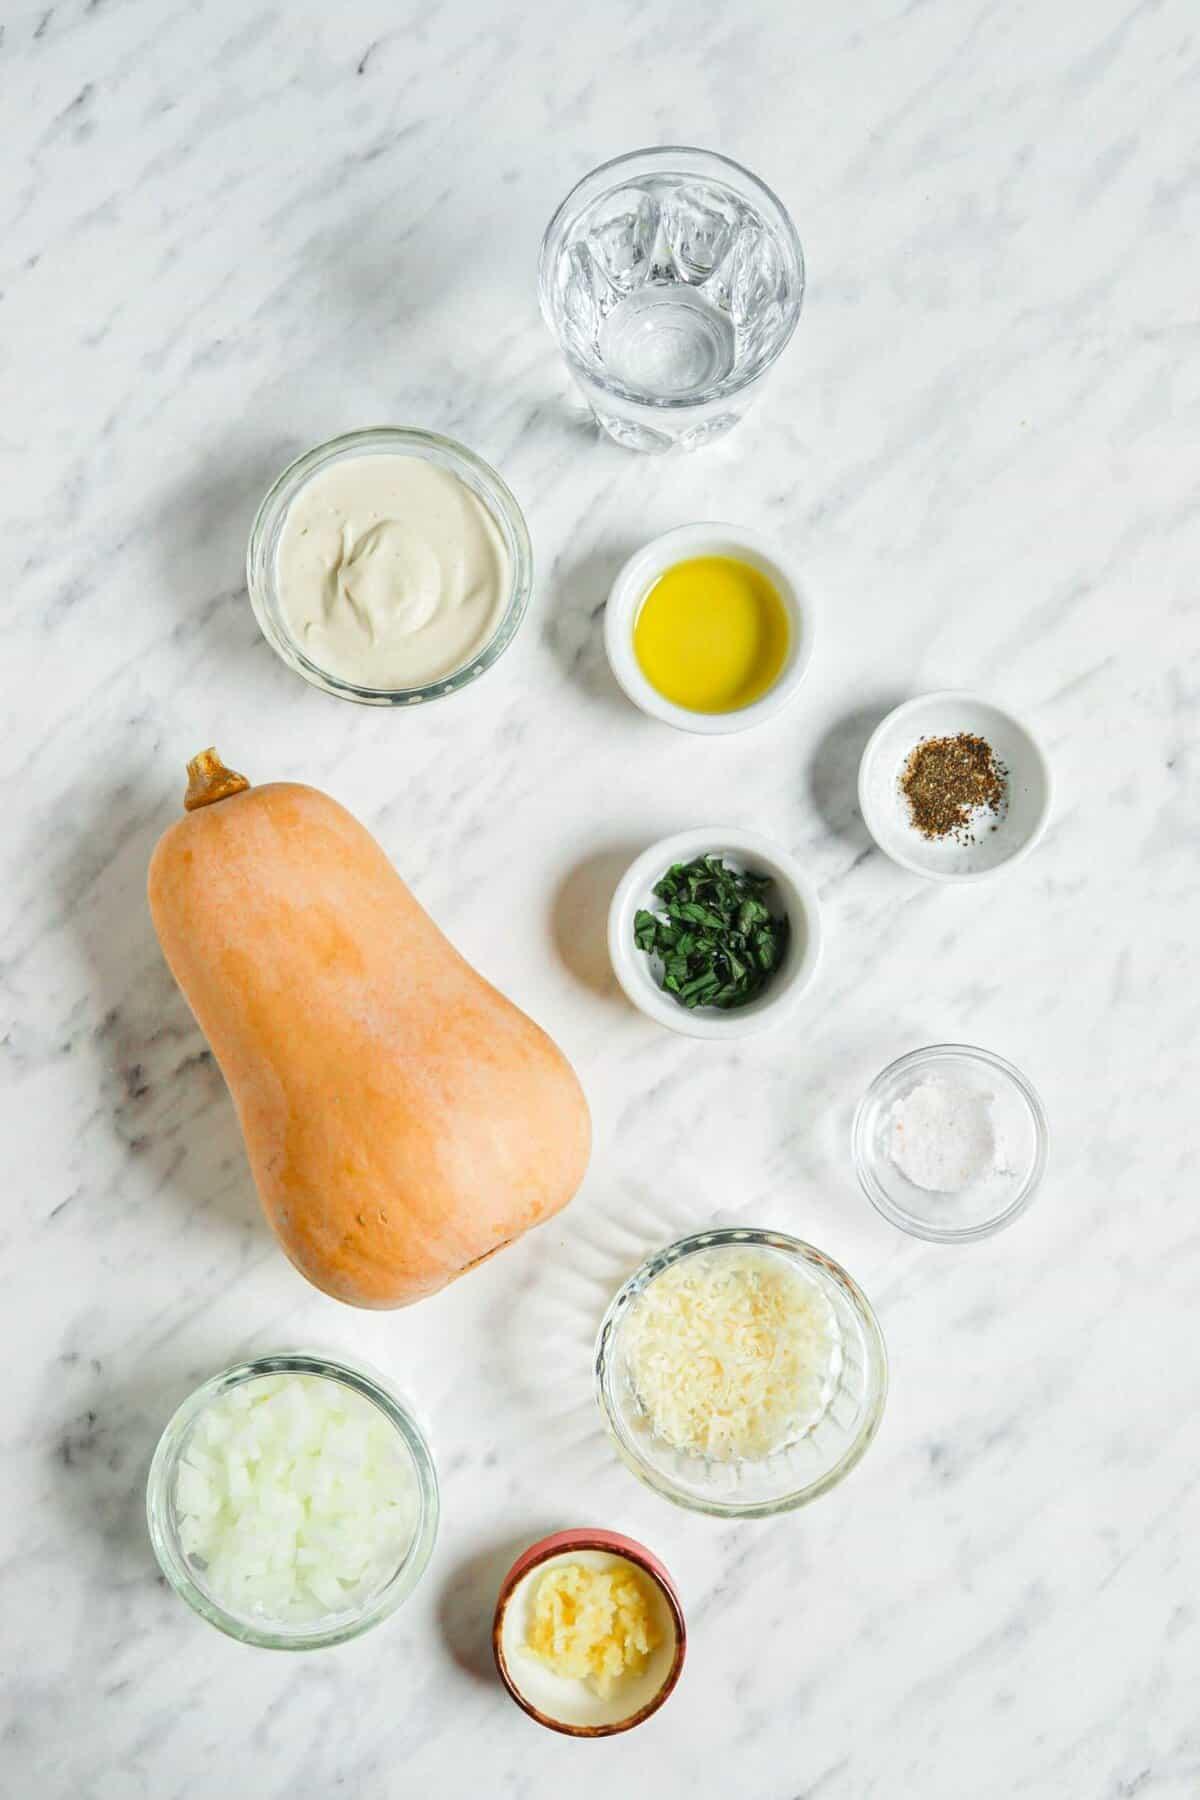 Vegan Butternut Squash Risotto Ingredients